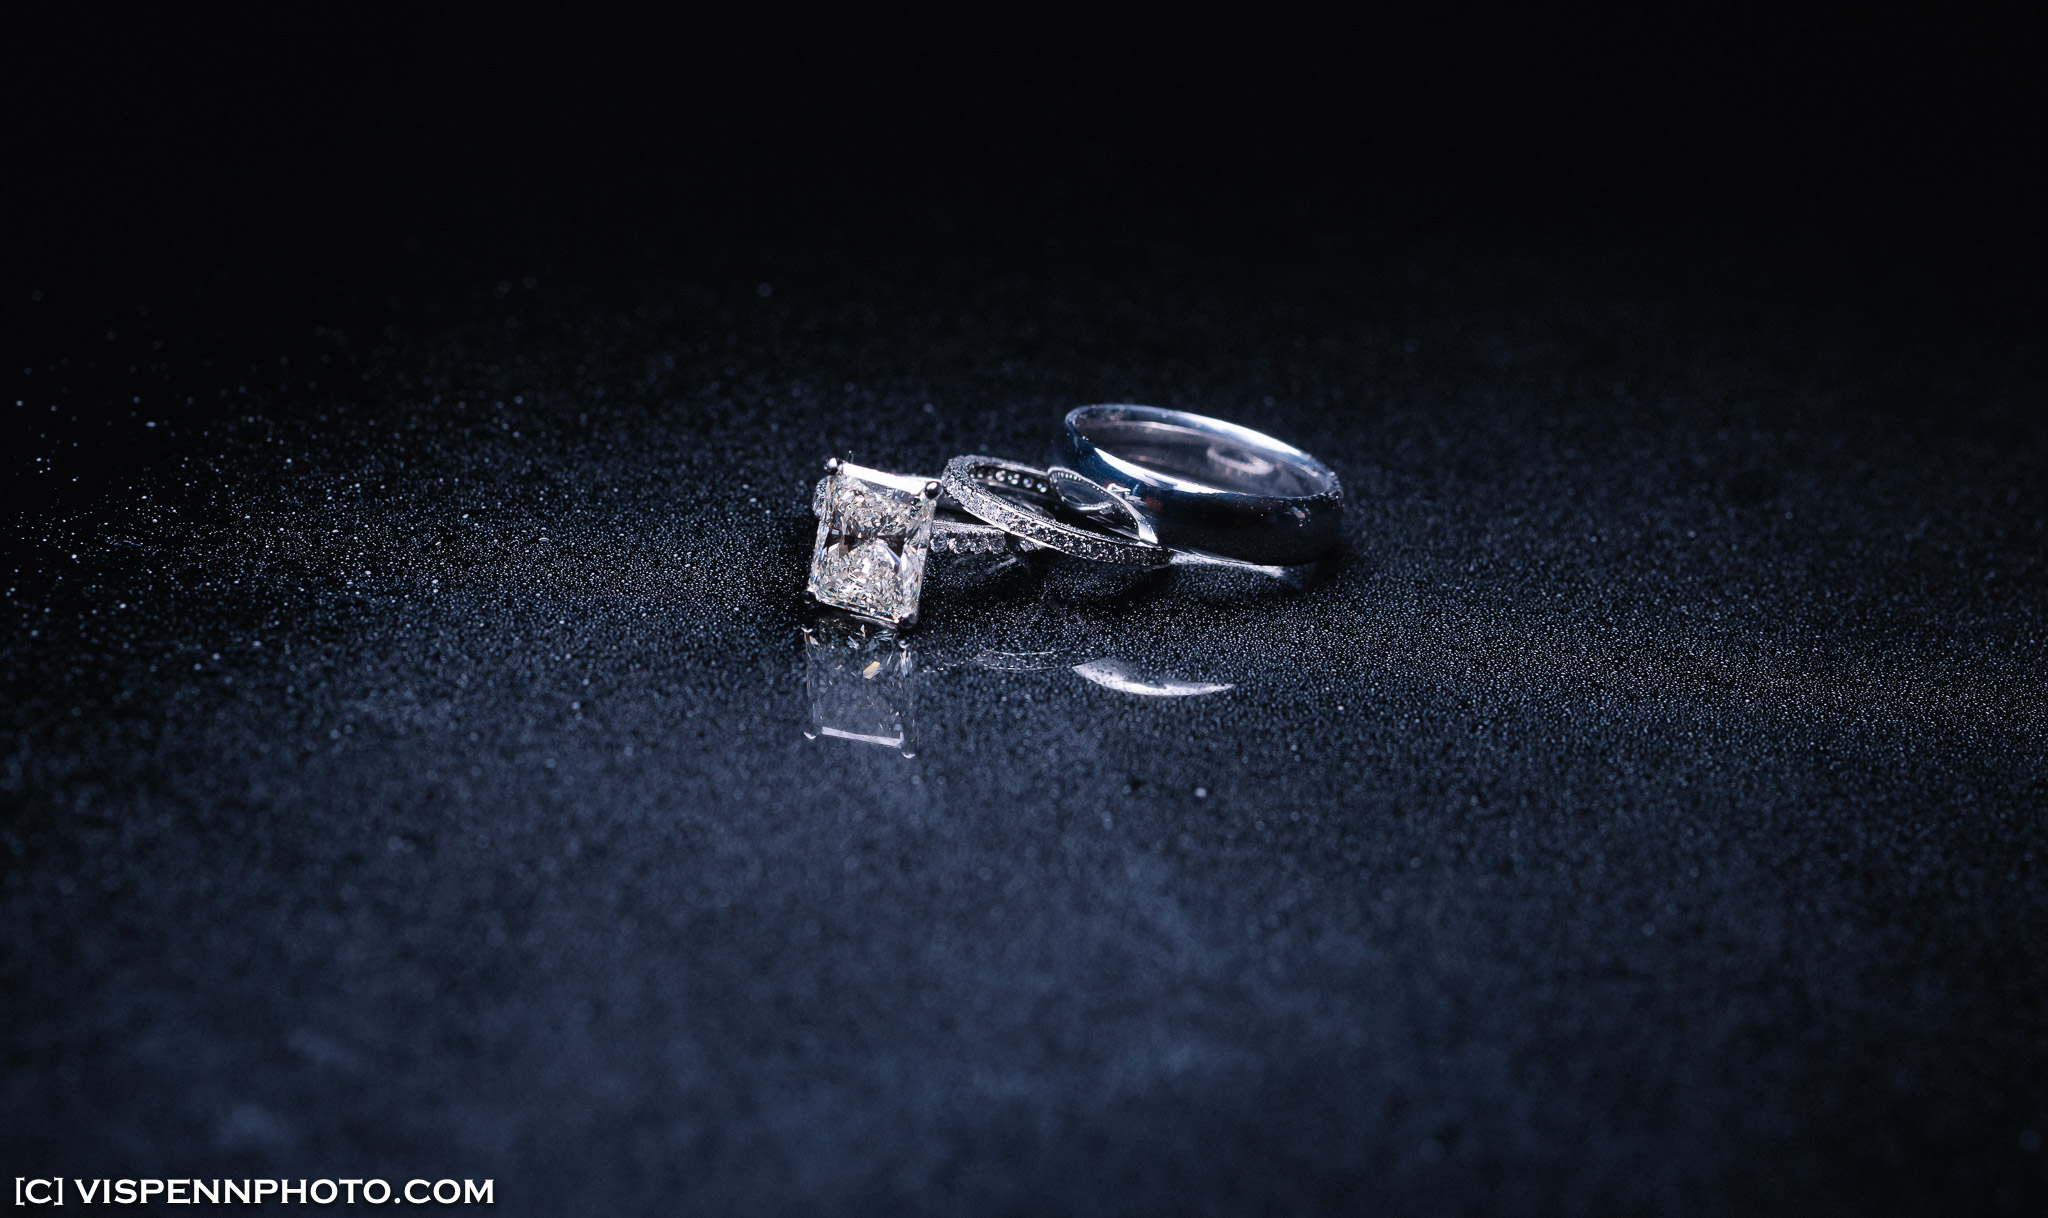 WEDDING DAY Photography Melbourne VISPENN 墨尔本 婚礼跟拍 婚礼摄像 婚礼摄影 结婚照 登记照 VISPENN Kat H1 01275